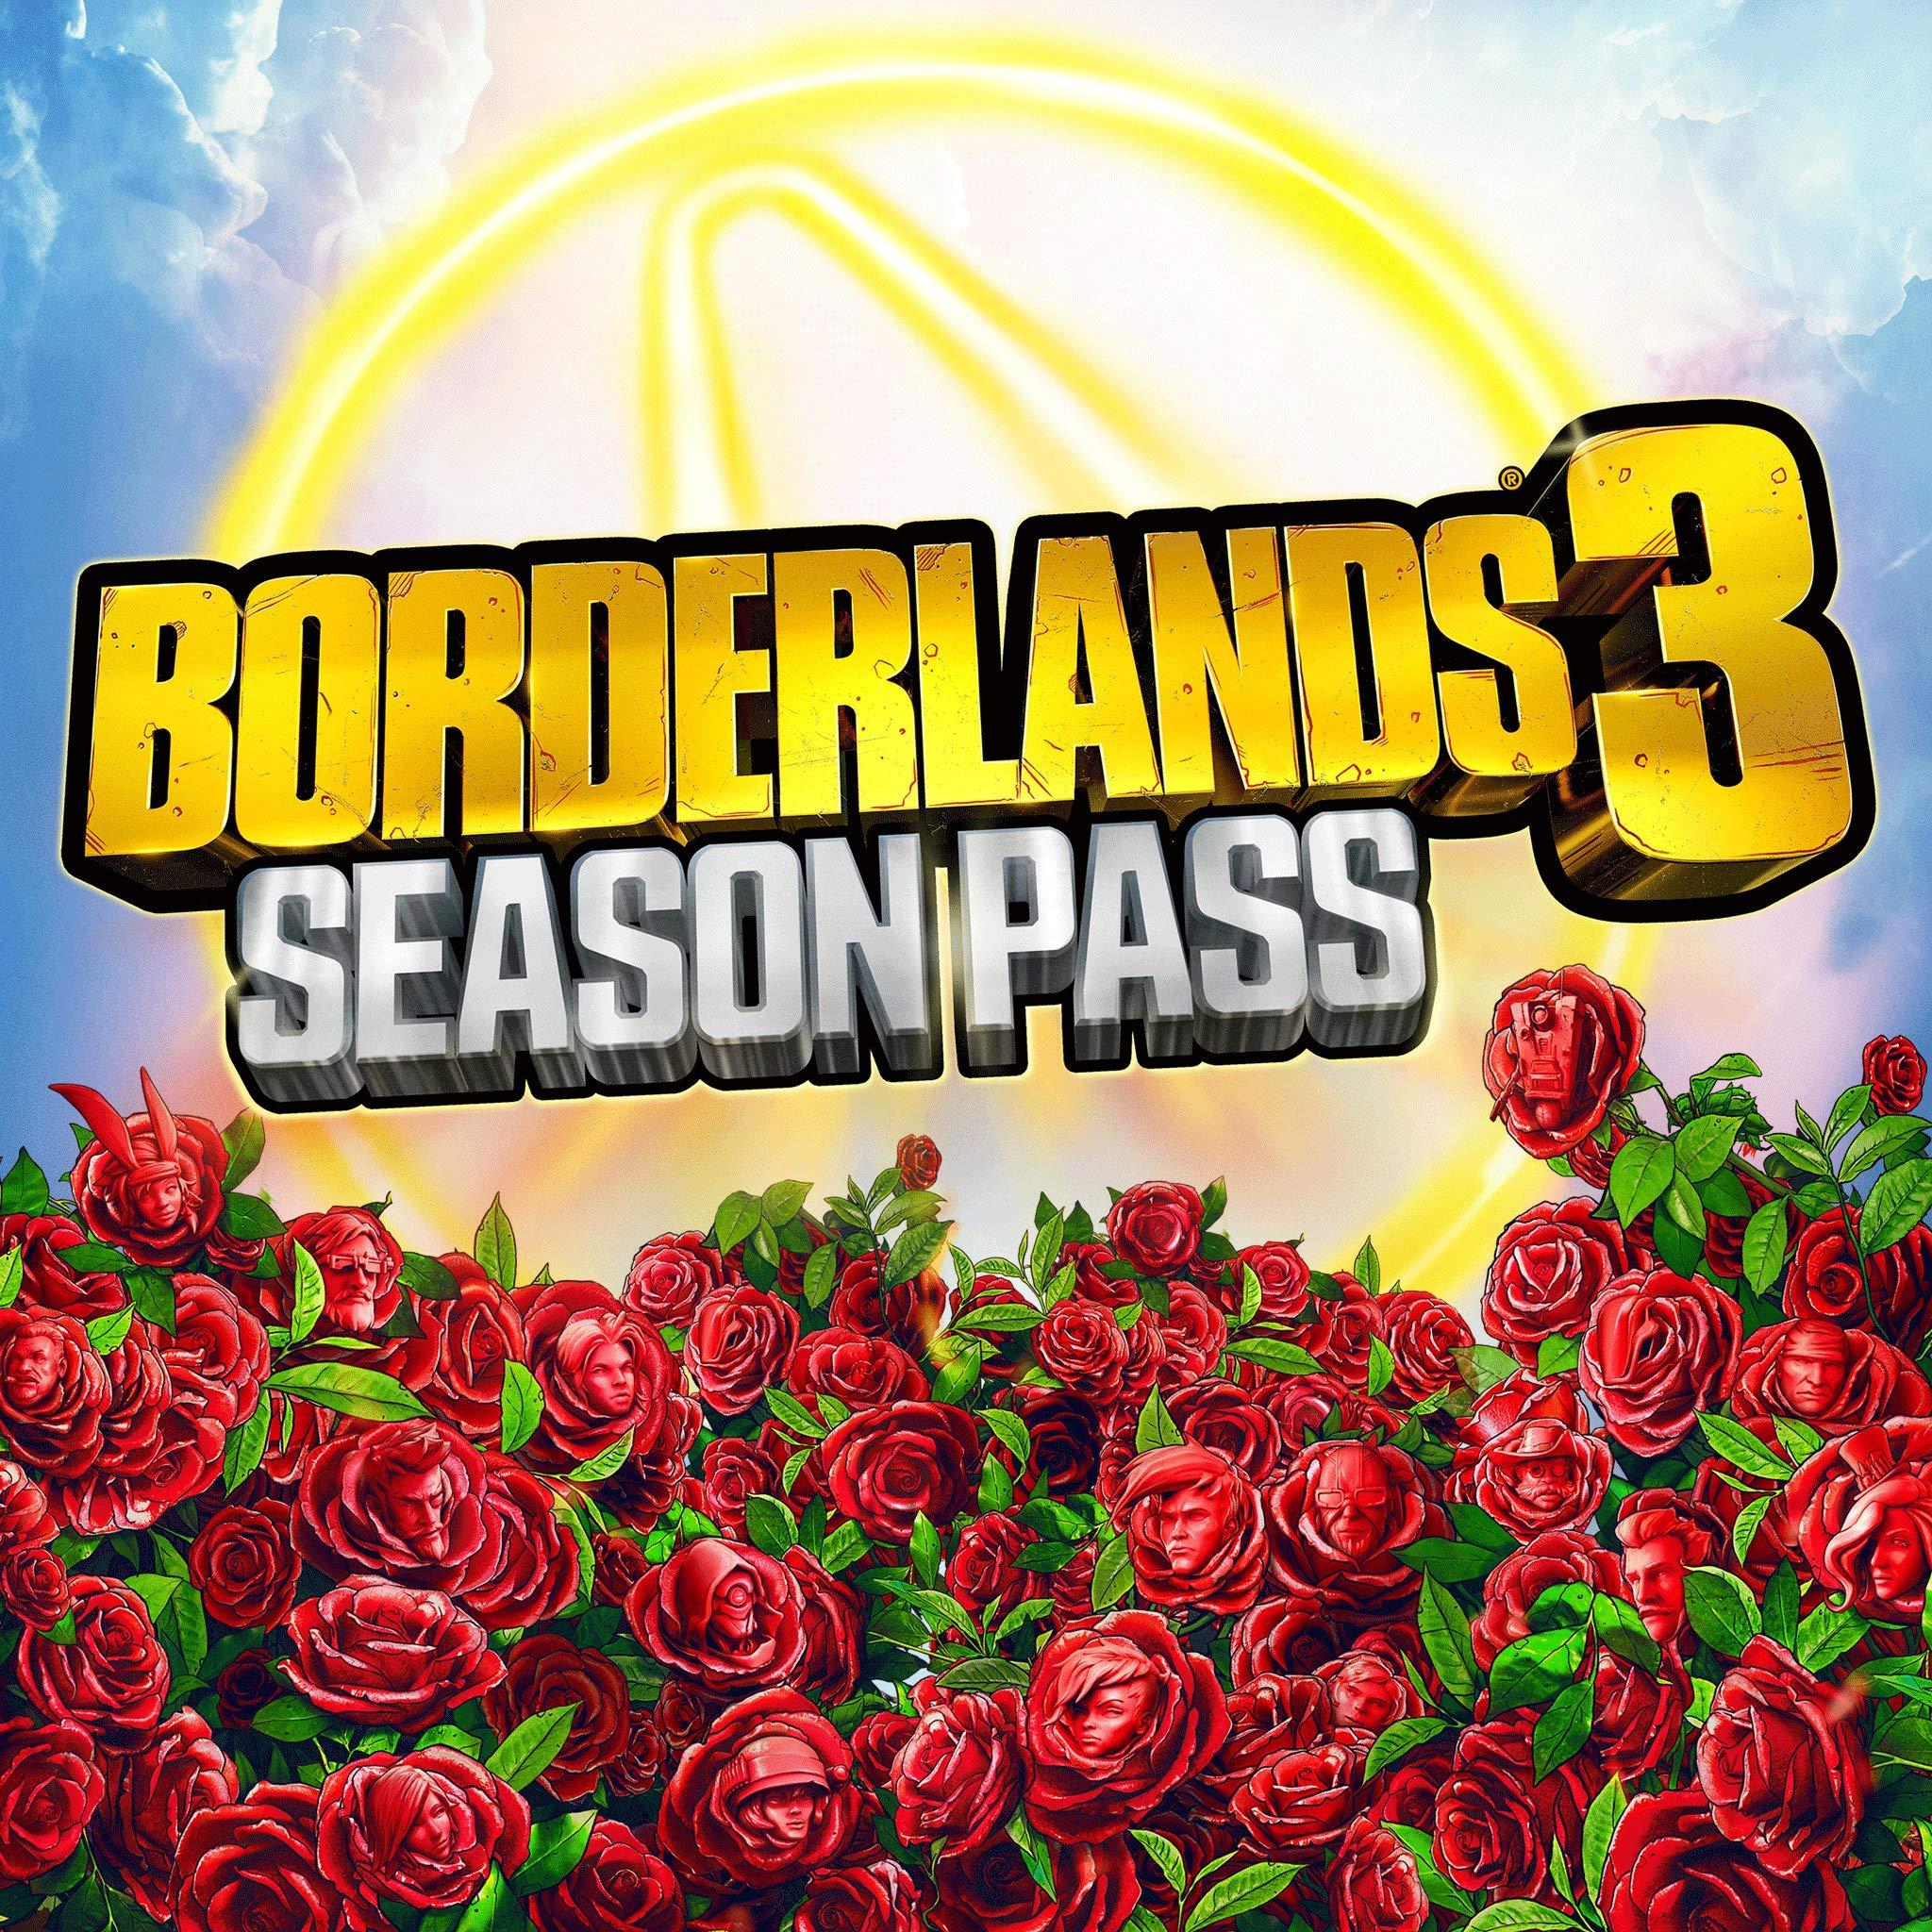 Borderlands 3 Season Pass - [PS4 Digital Code]